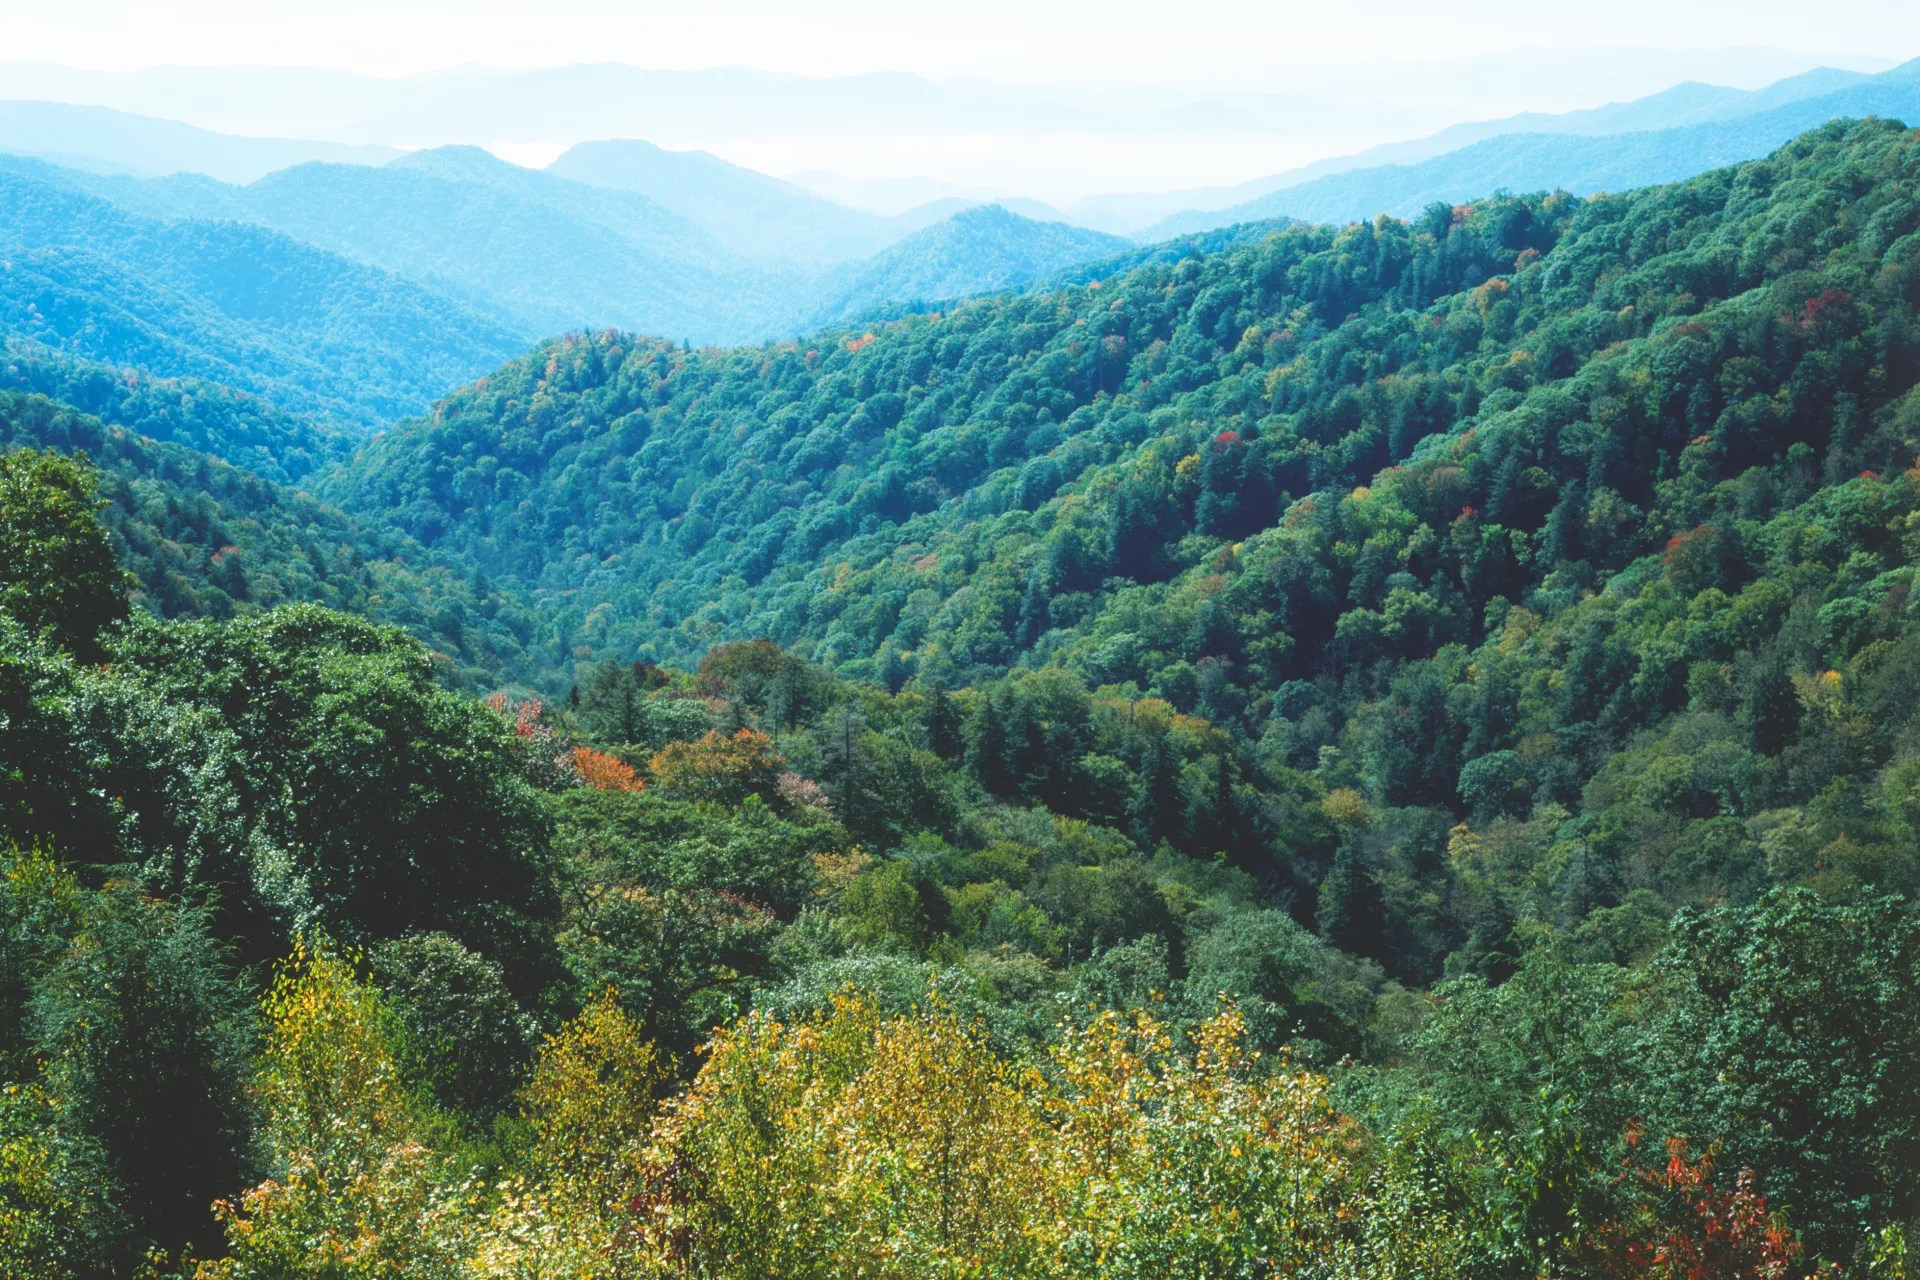 Appalachian Mountain Facts For Kids